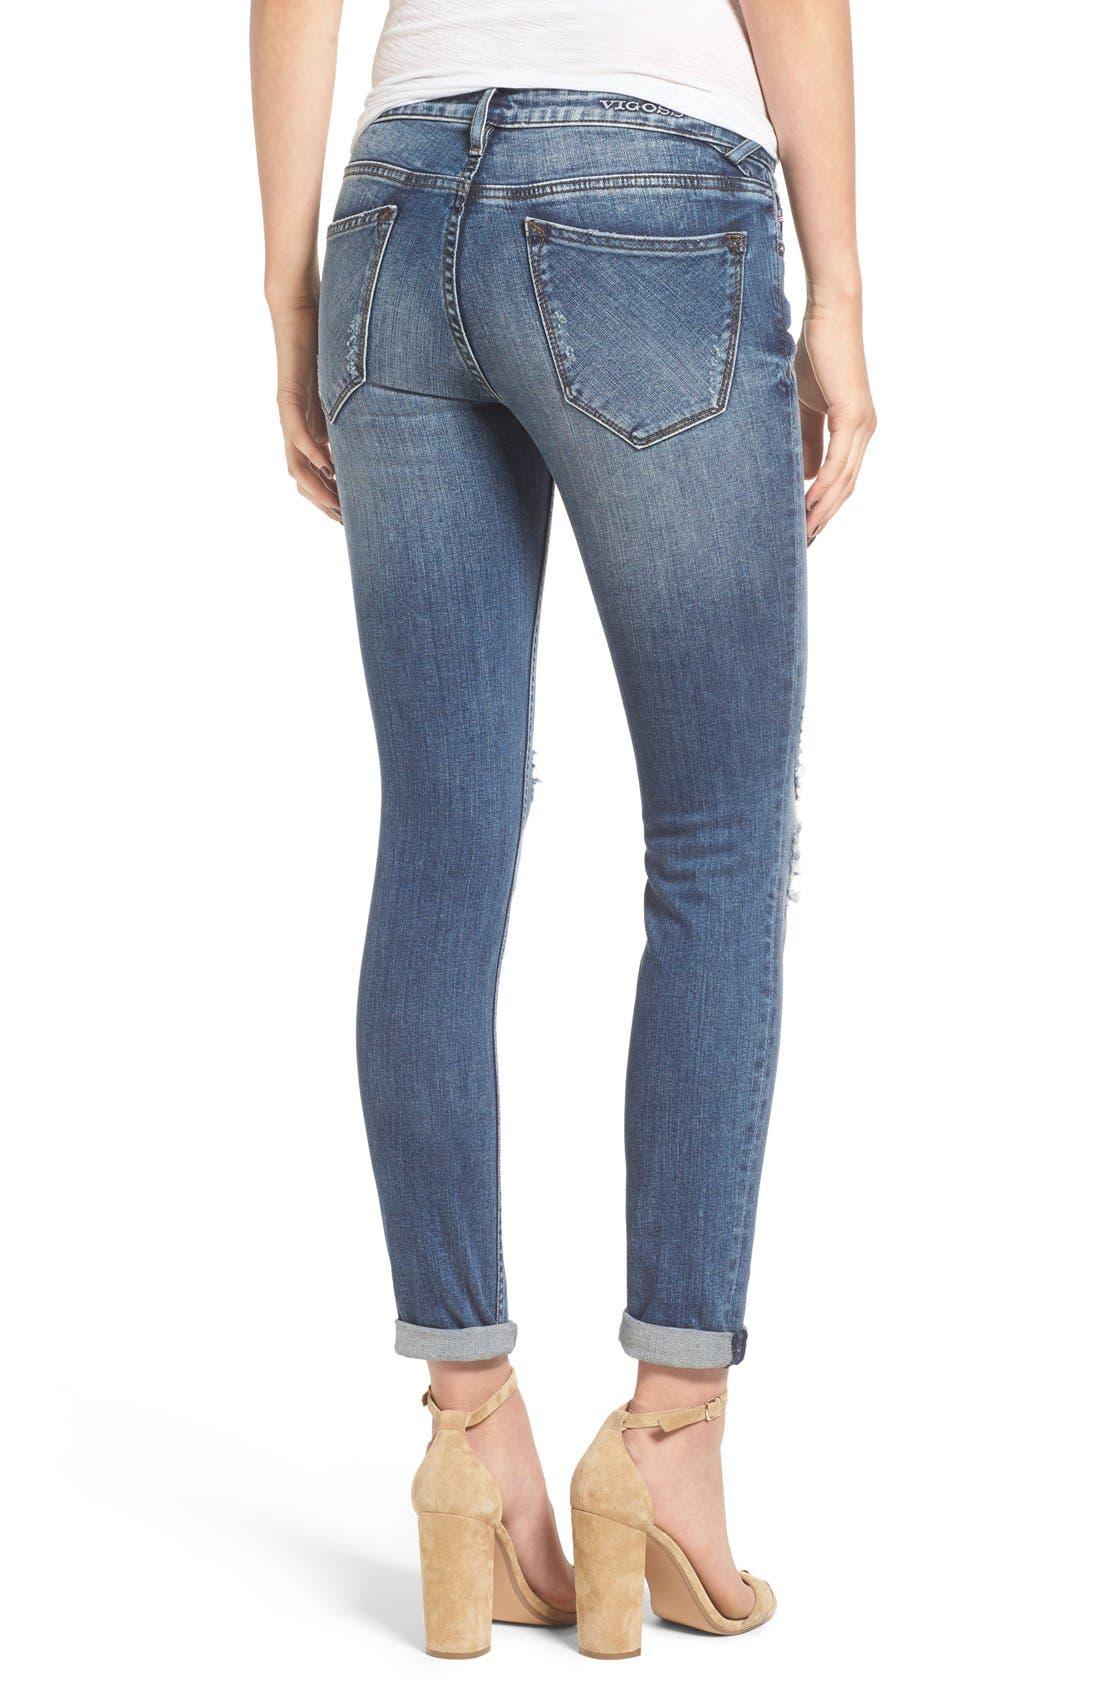 VIGOSS, 'Thompson Tomboy' Ripped Boyfriend Jeans, Alternate thumbnail 3, color, 400